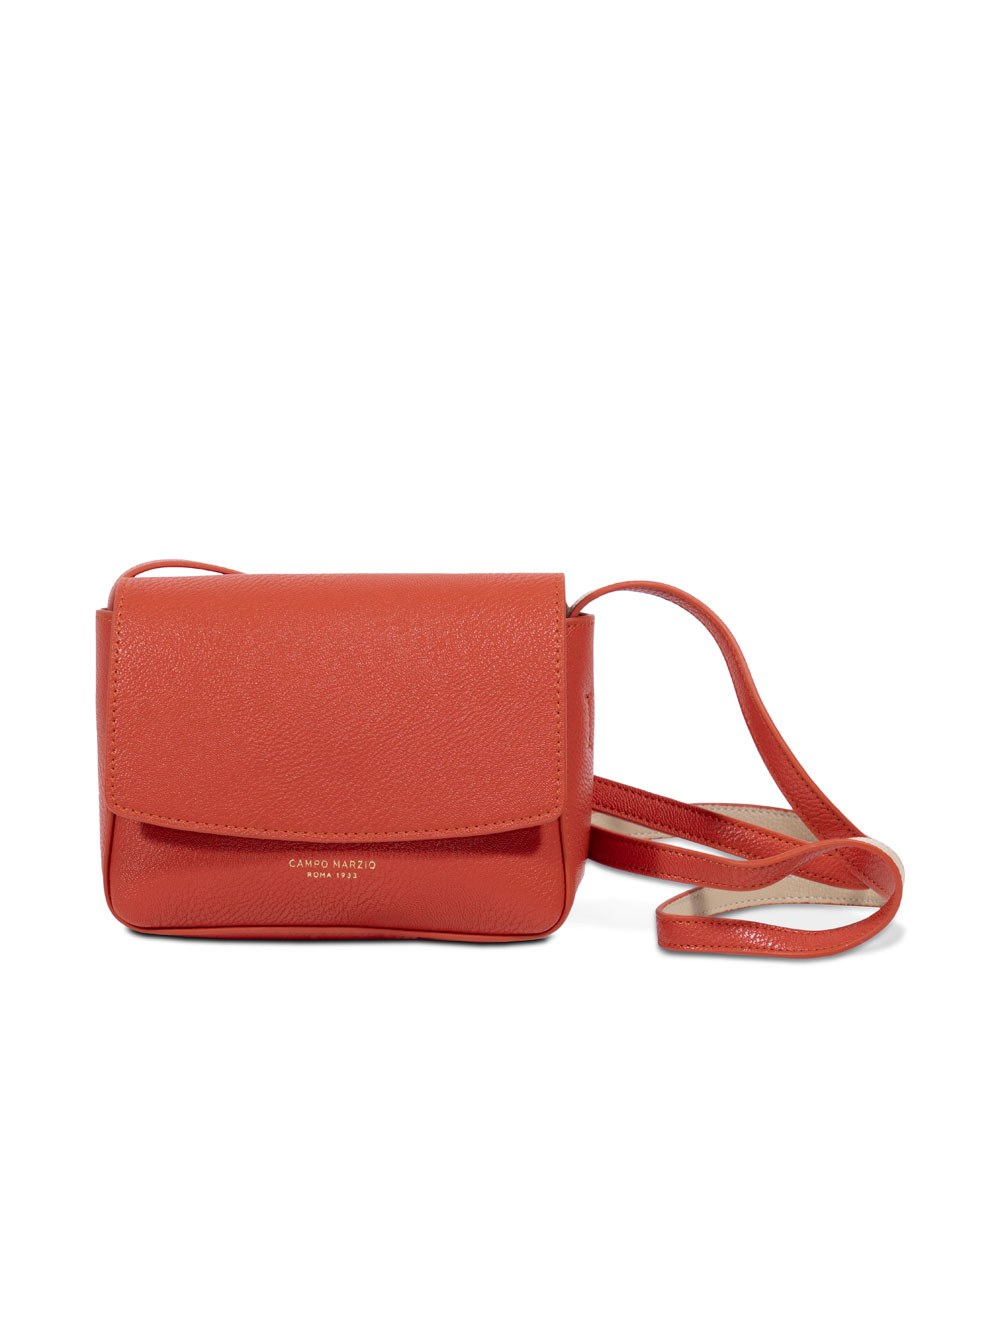 Mini Bag with Crossbody Strap - Tangerine Tango